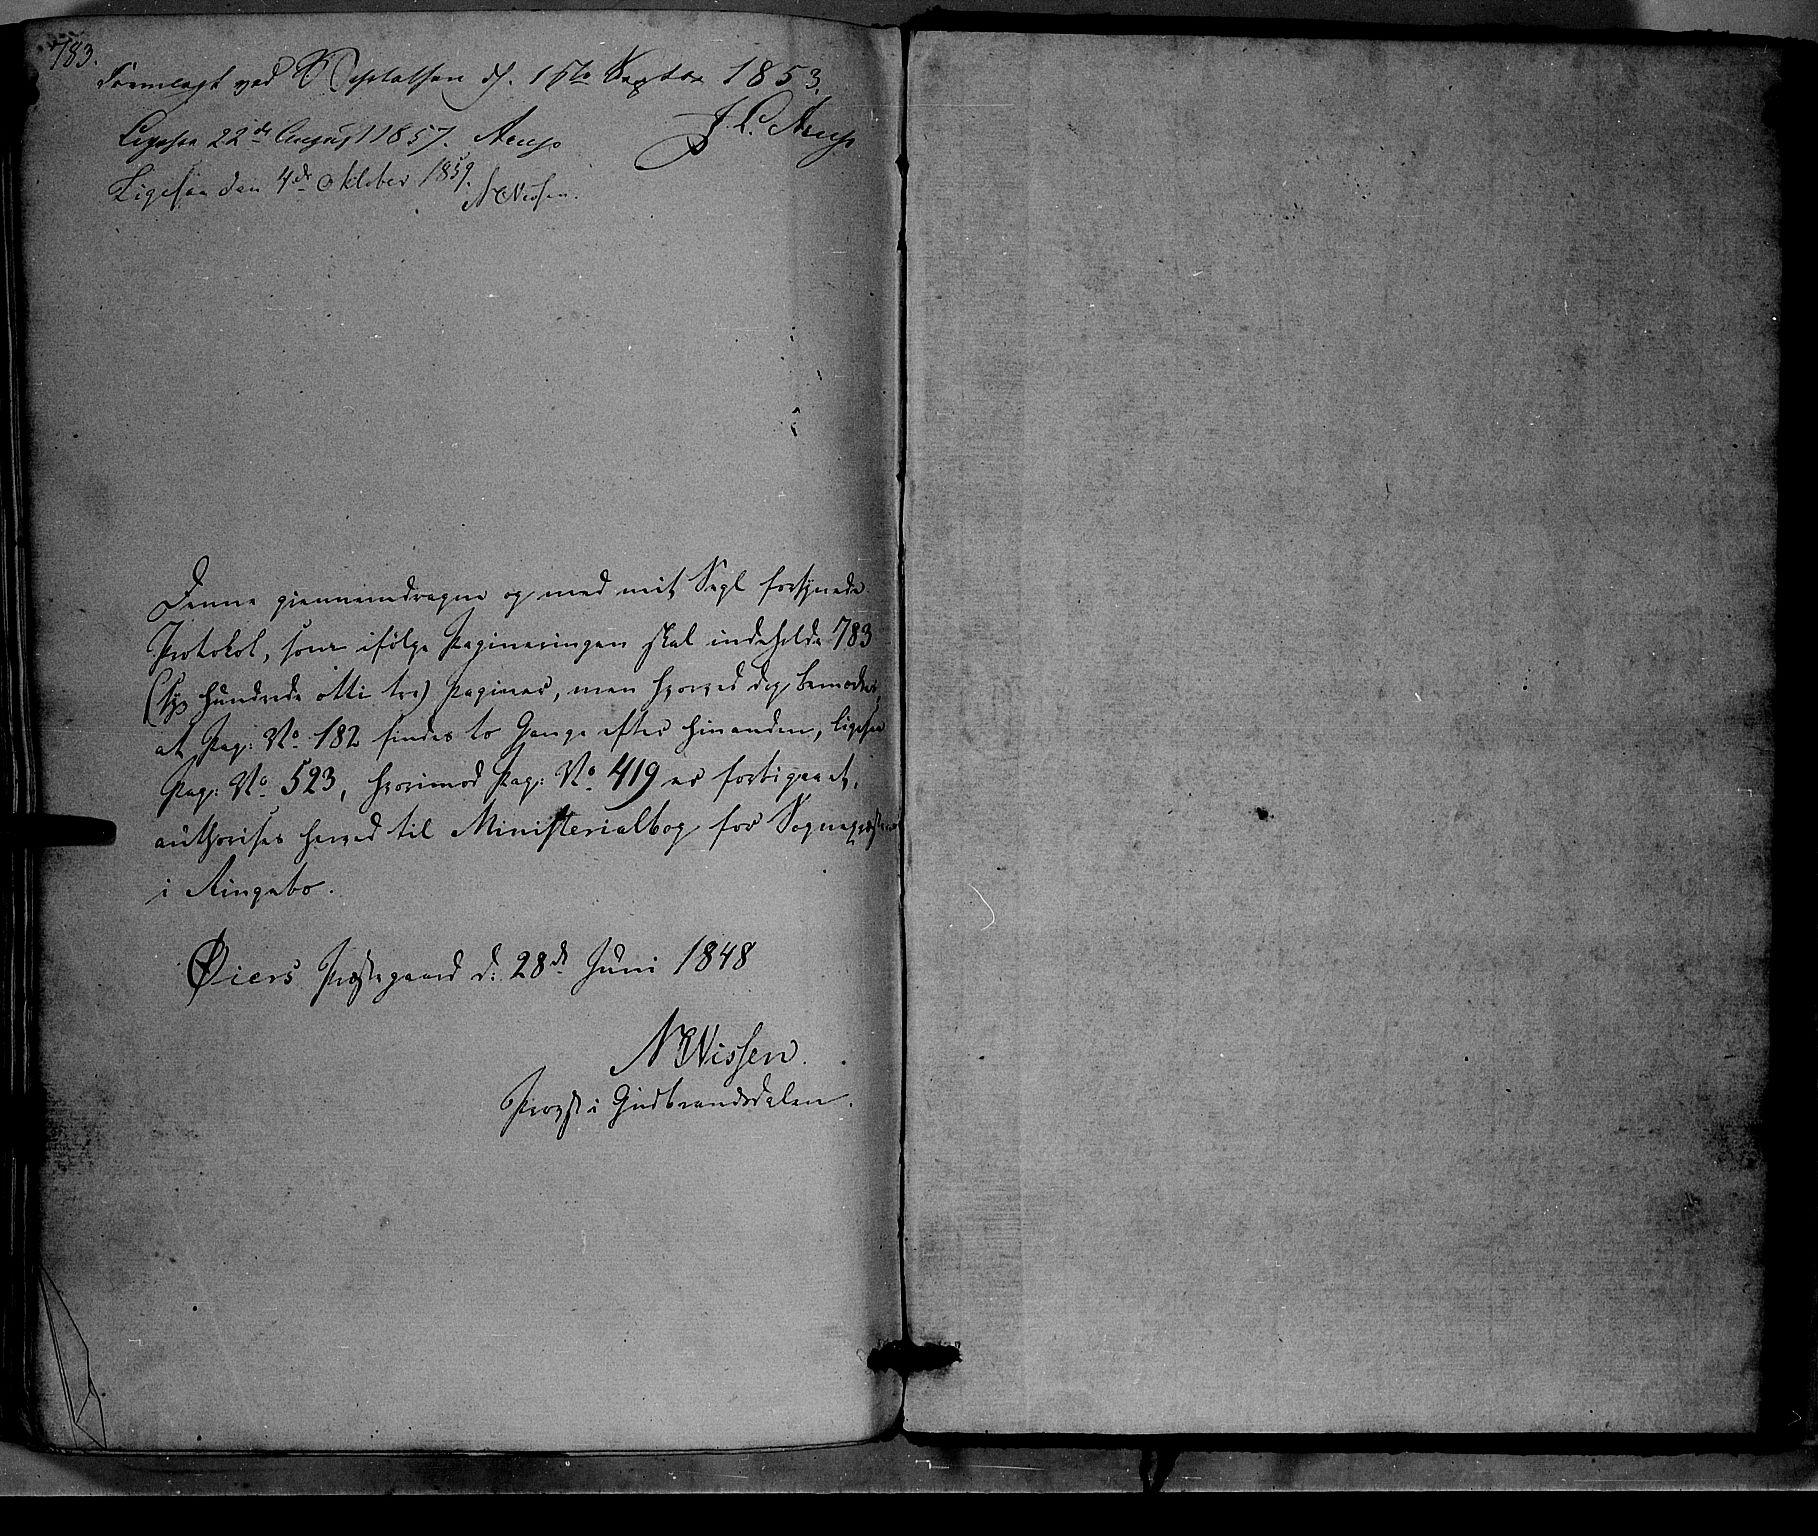 SAH, Ringebu prestekontor, Ministerialbok nr. 6, 1848-1859, s. 783-784